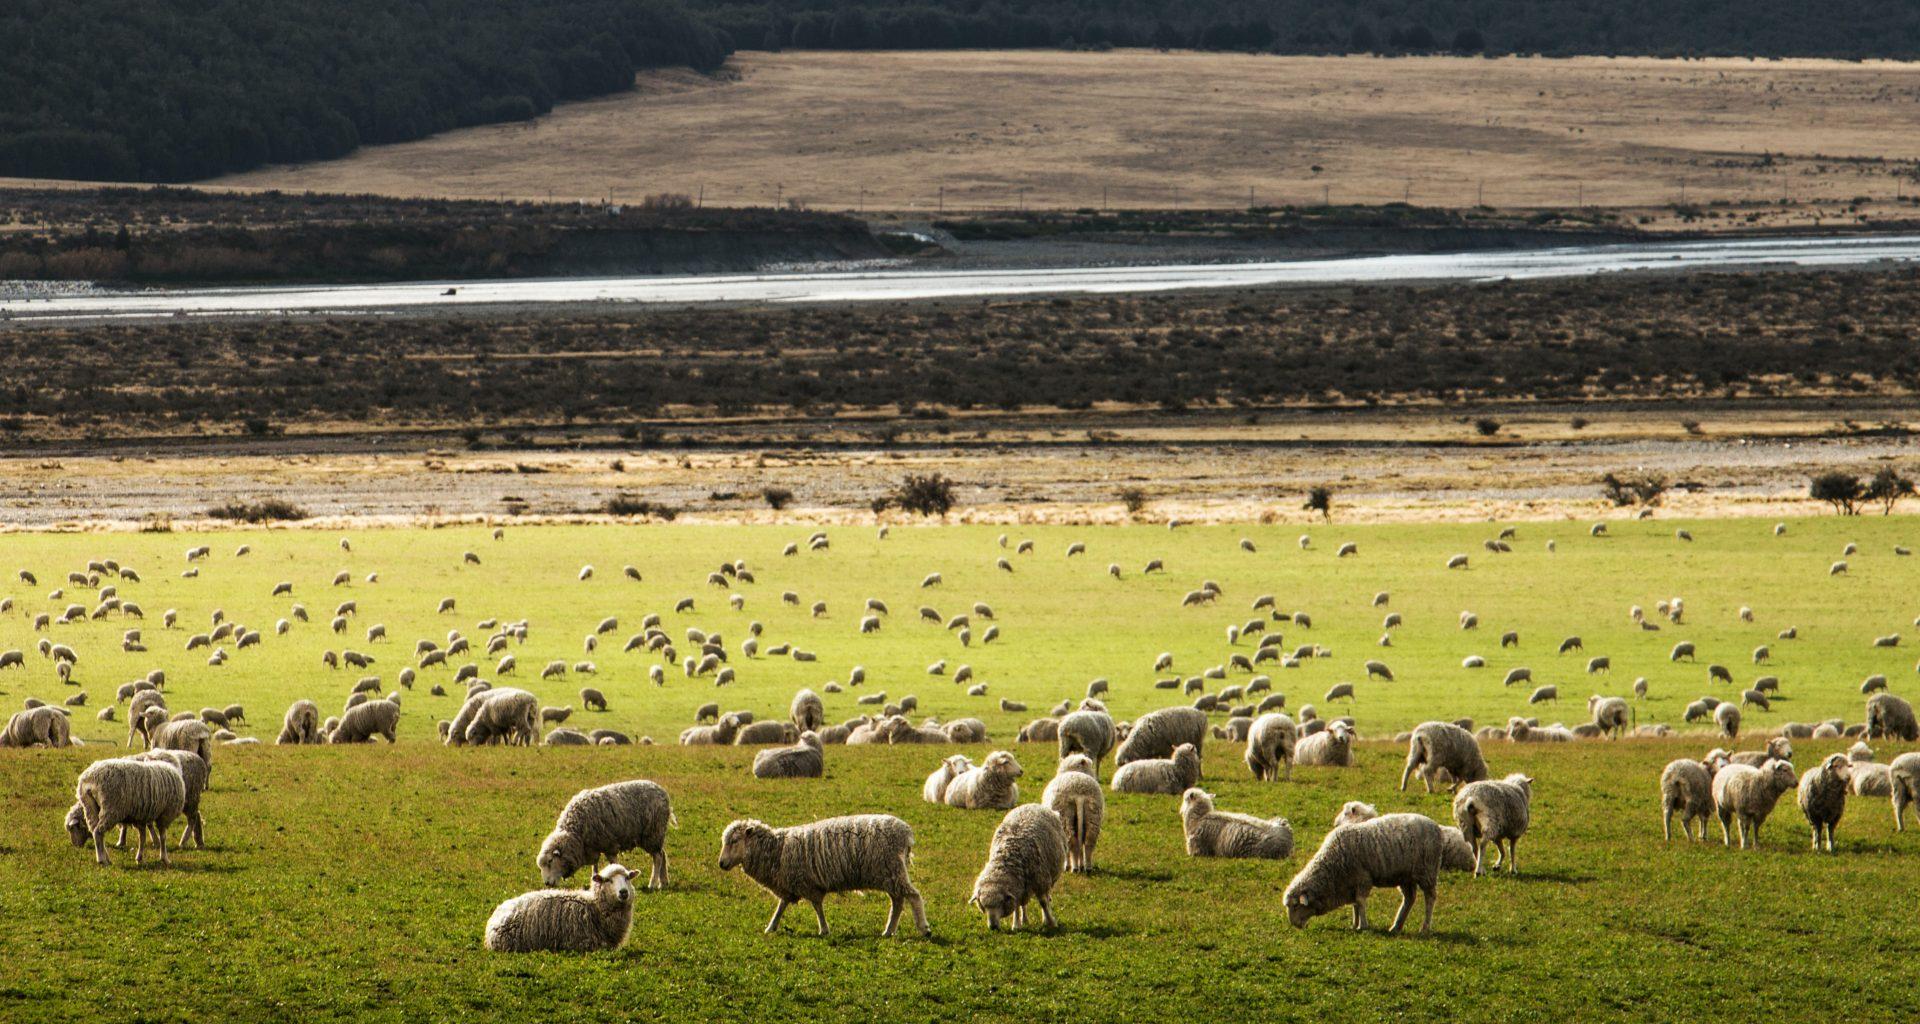 NZ land use